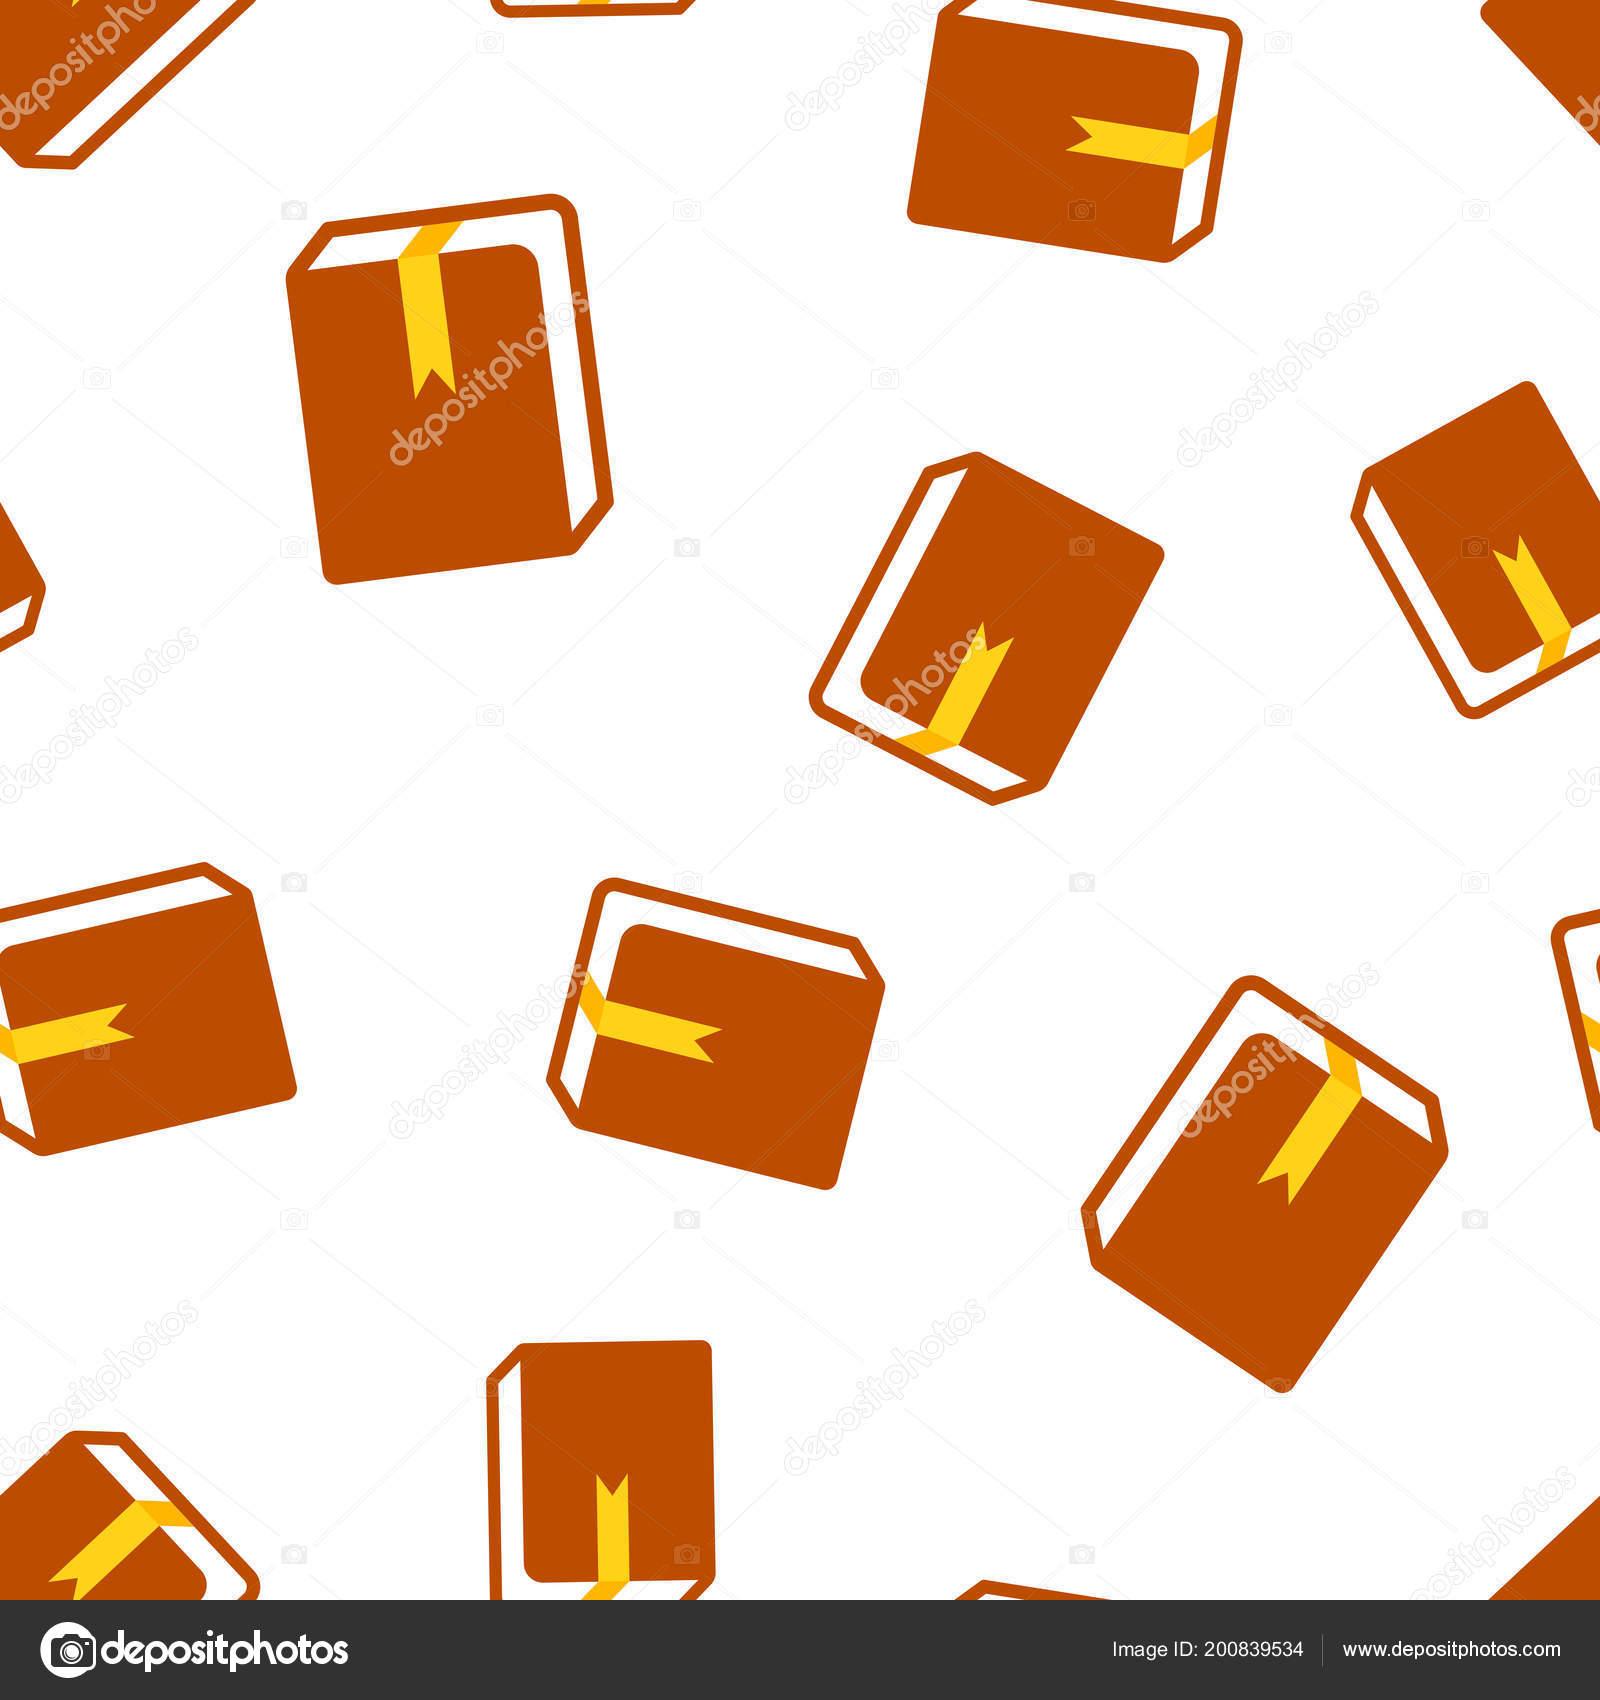 Livre Bibliotheque Icone Sans Soudure Fond Illustration